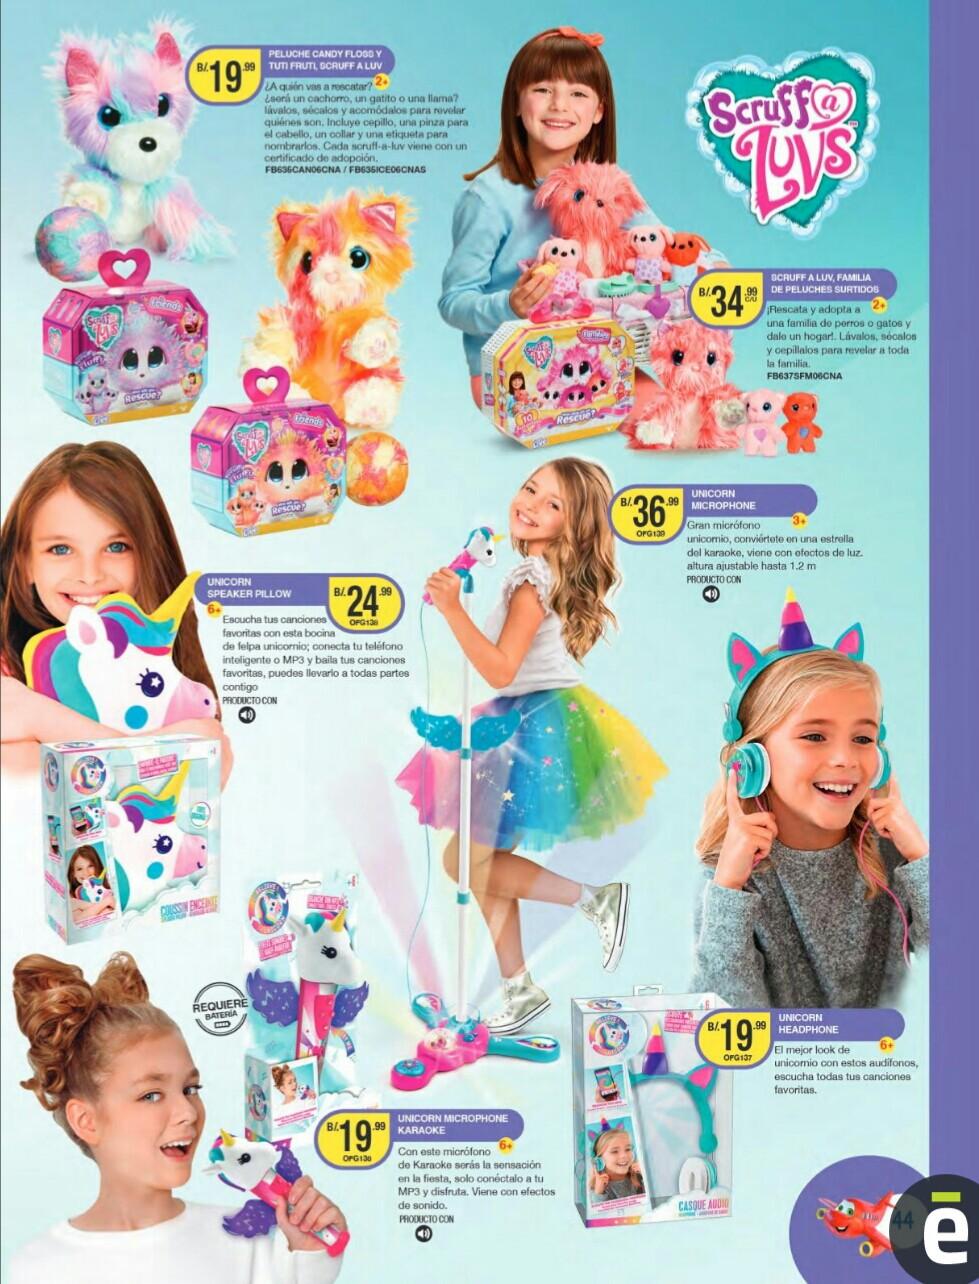 Catalogo juguetes Titan Toys 2019 p44